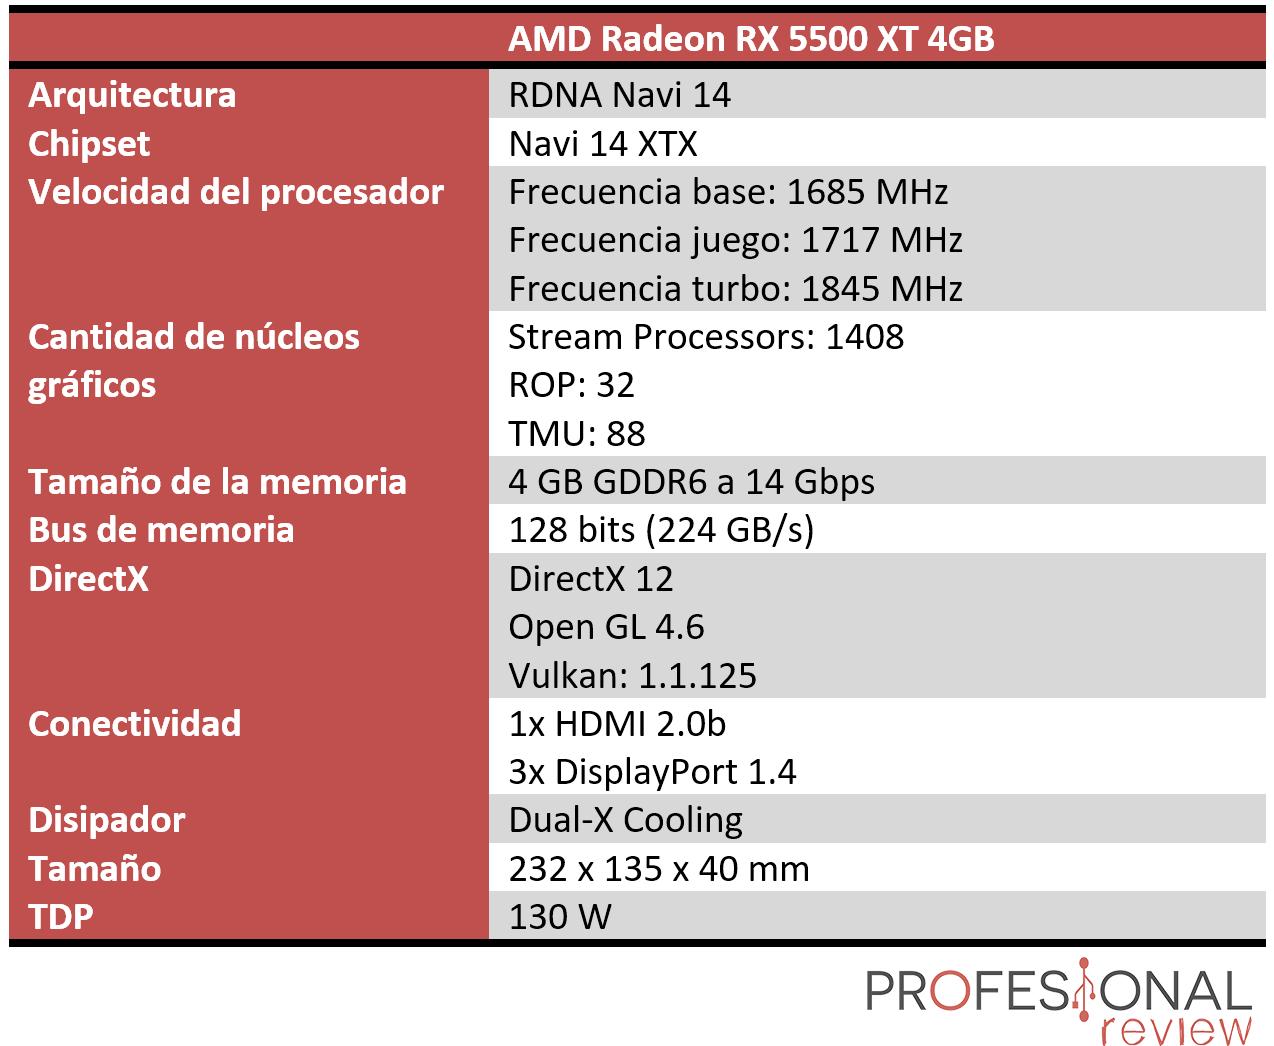 AMD Radeon RX 5500 XT características